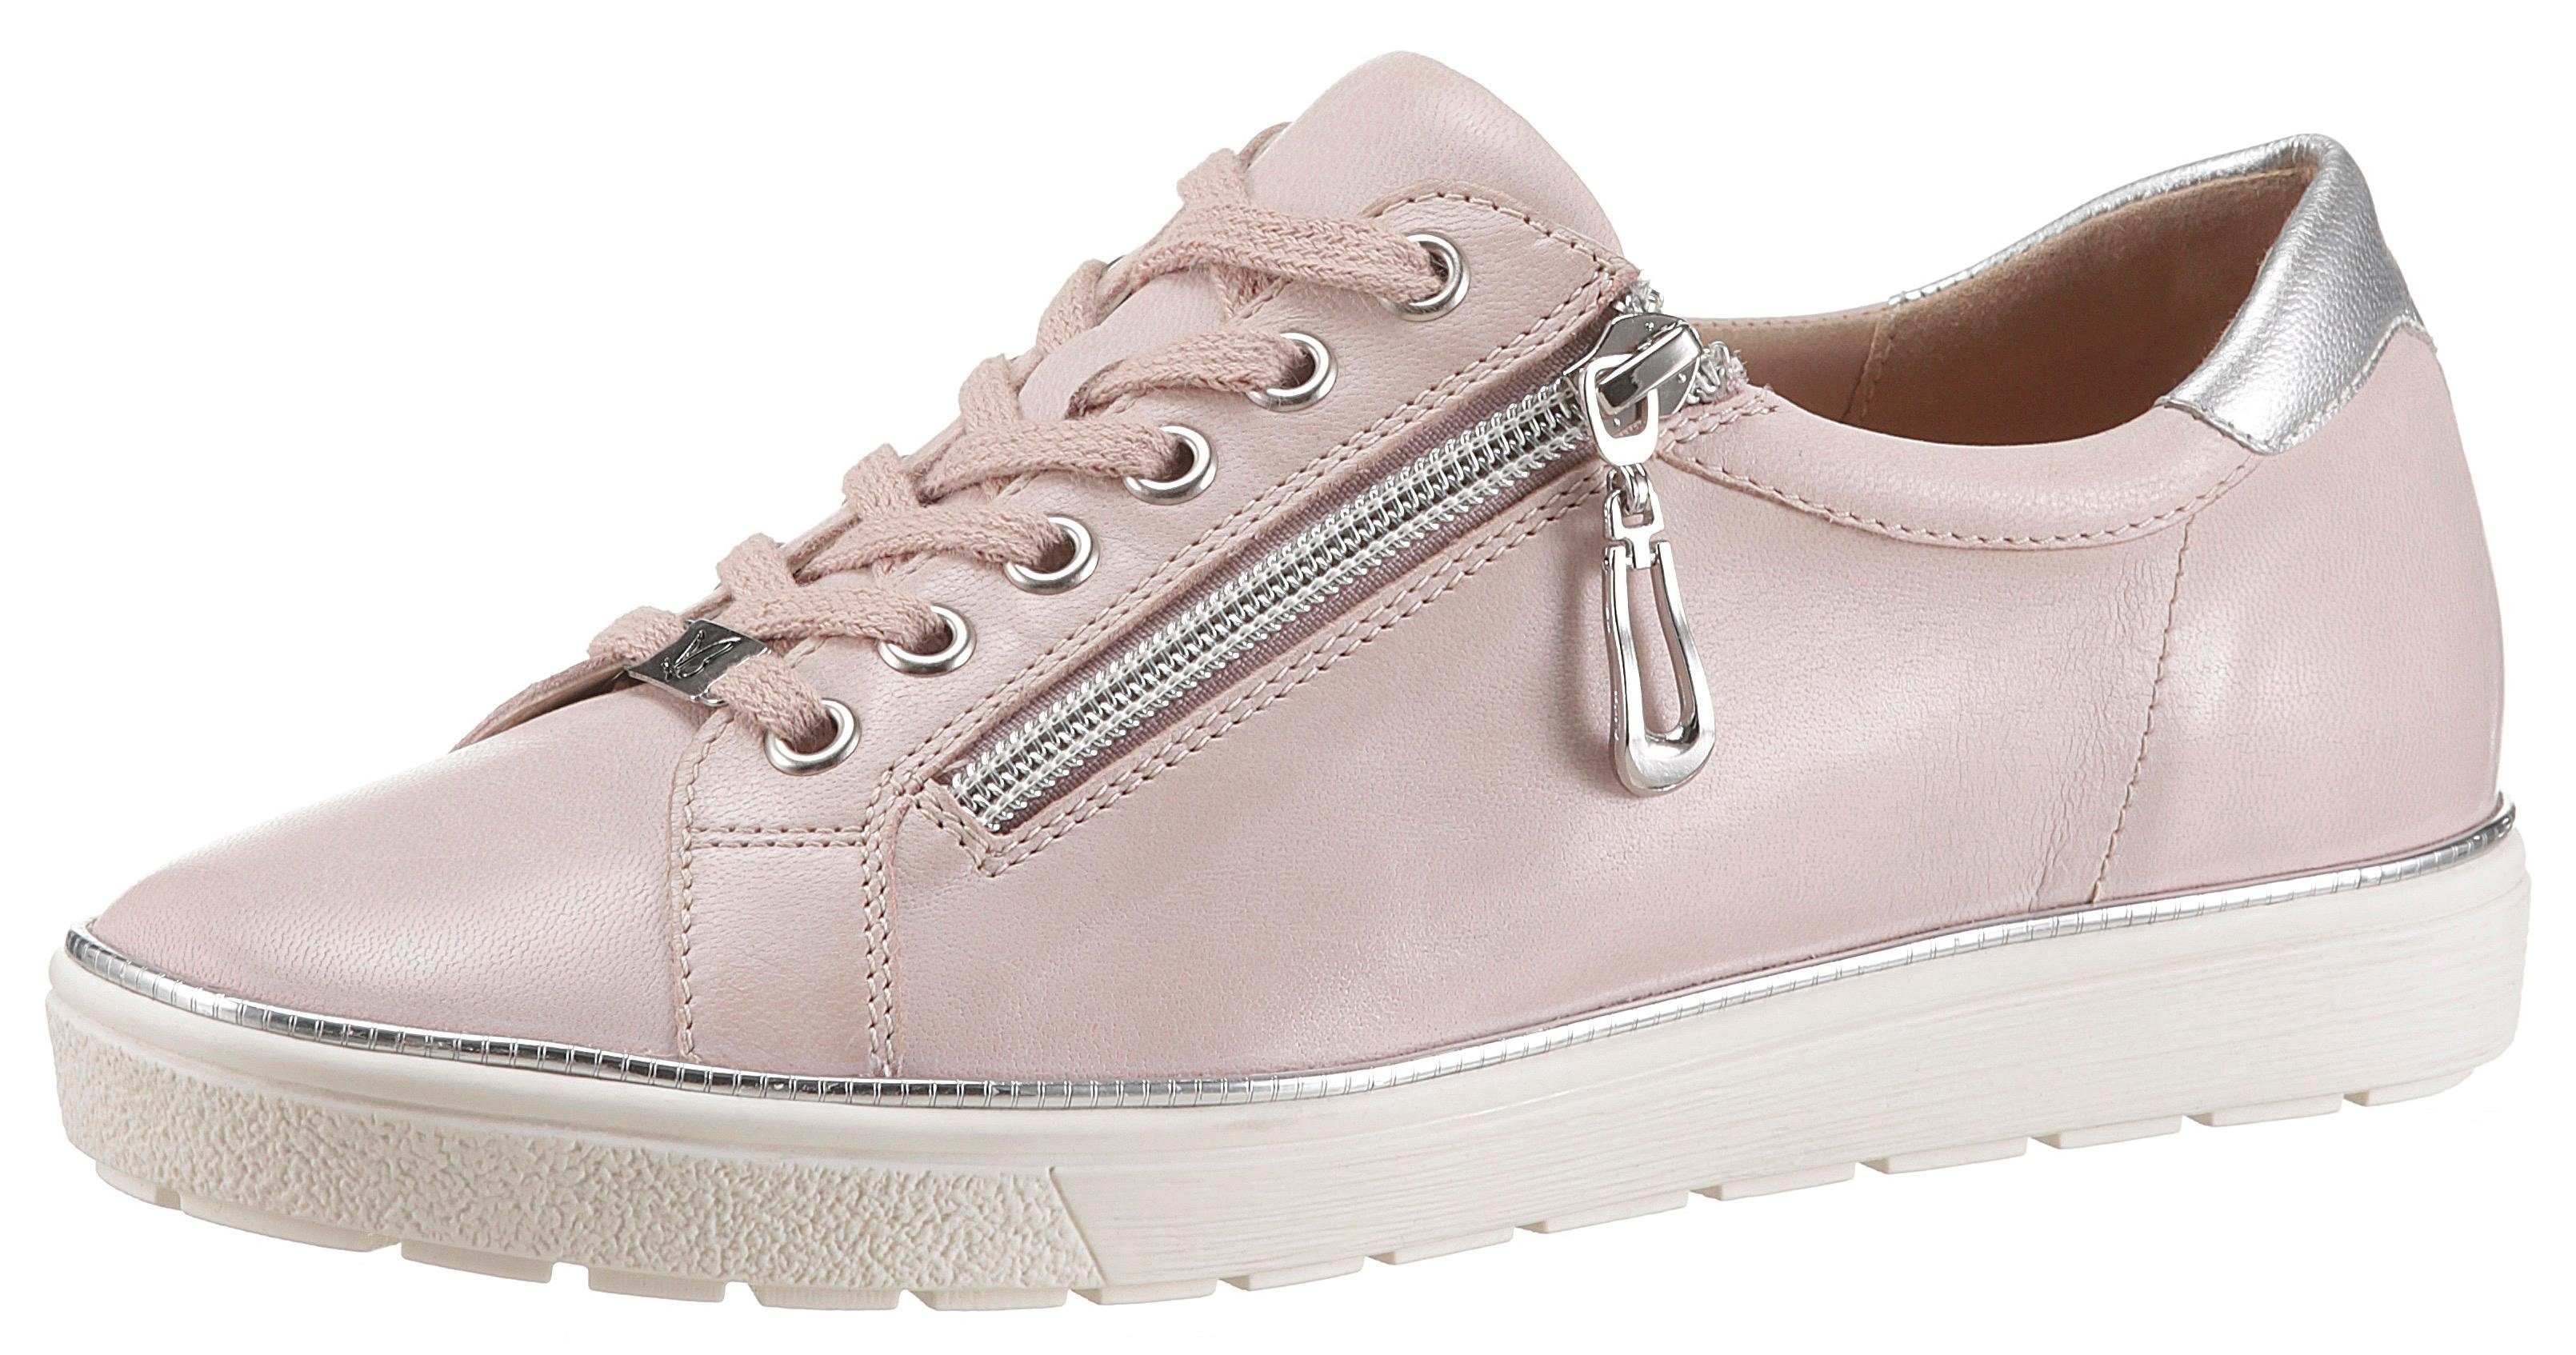 Sneaker In Caprice Sneaker Schuhweite Caprice GweitKaufenOtto c4A5L3Rjq